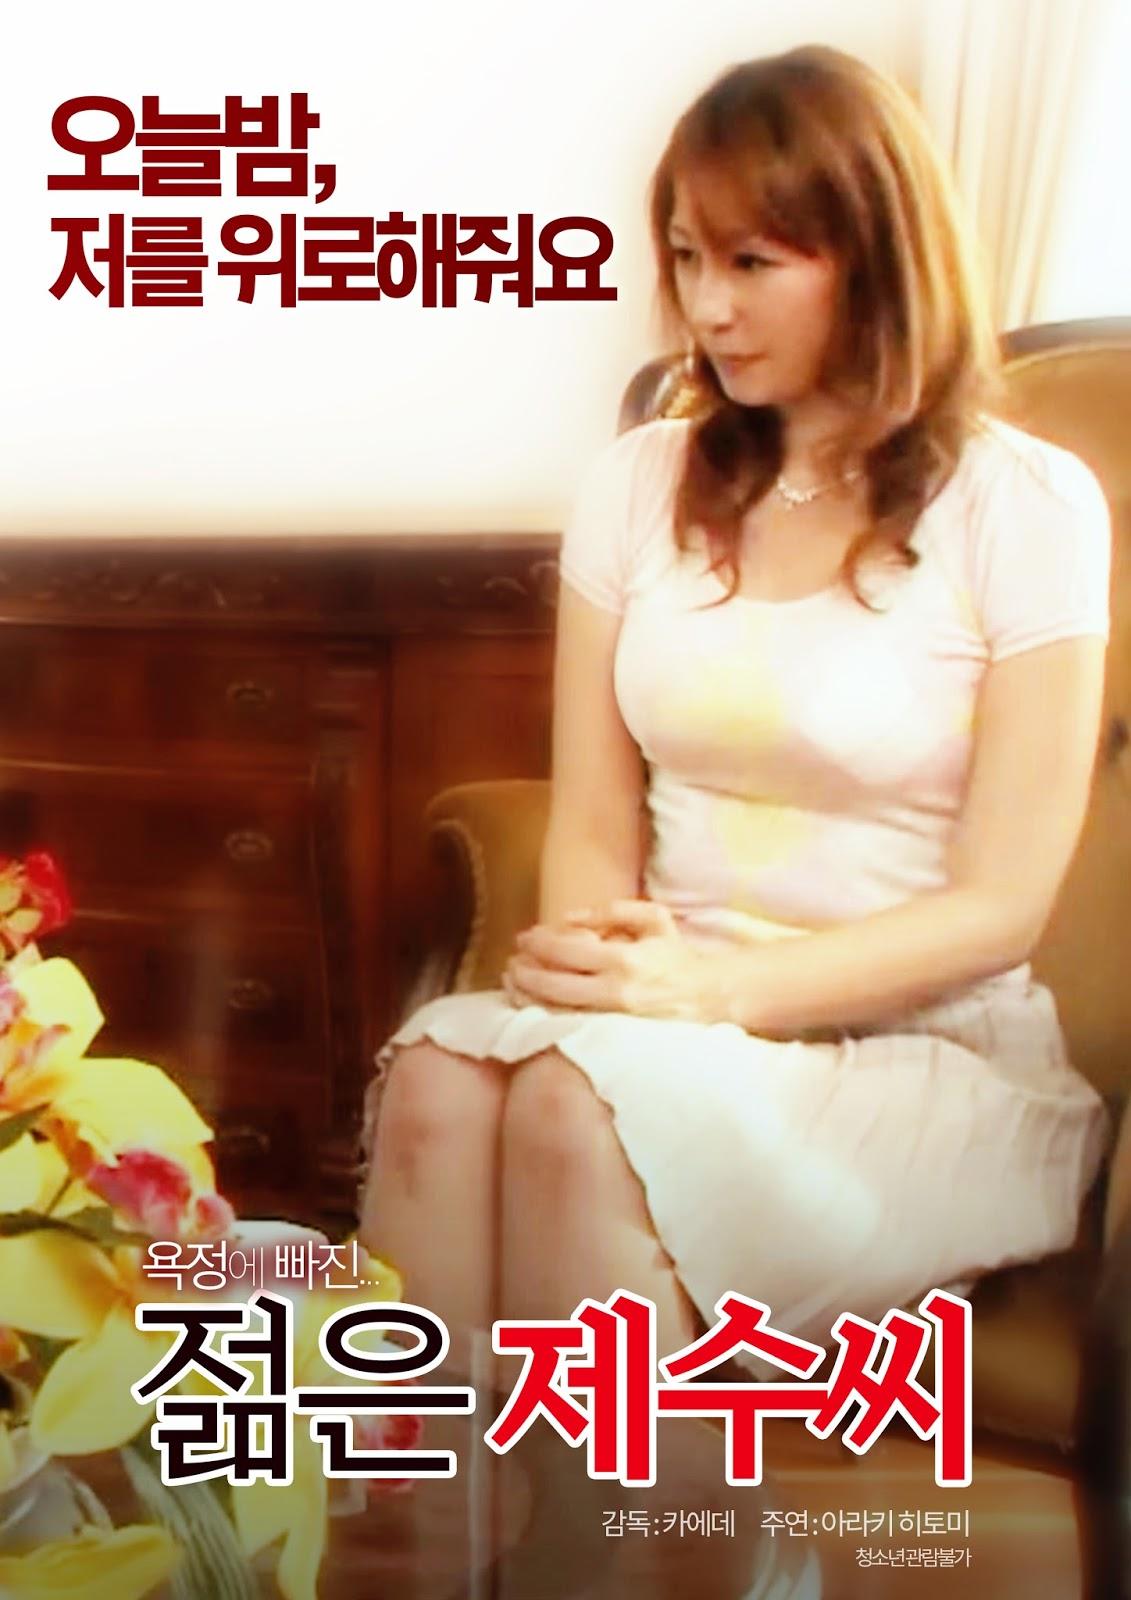 Miboujin Geshuku Araki Hitomi (2011) [ญี่ปุ่น 18+] Soundtrack ไม่มีบรรยายไทย